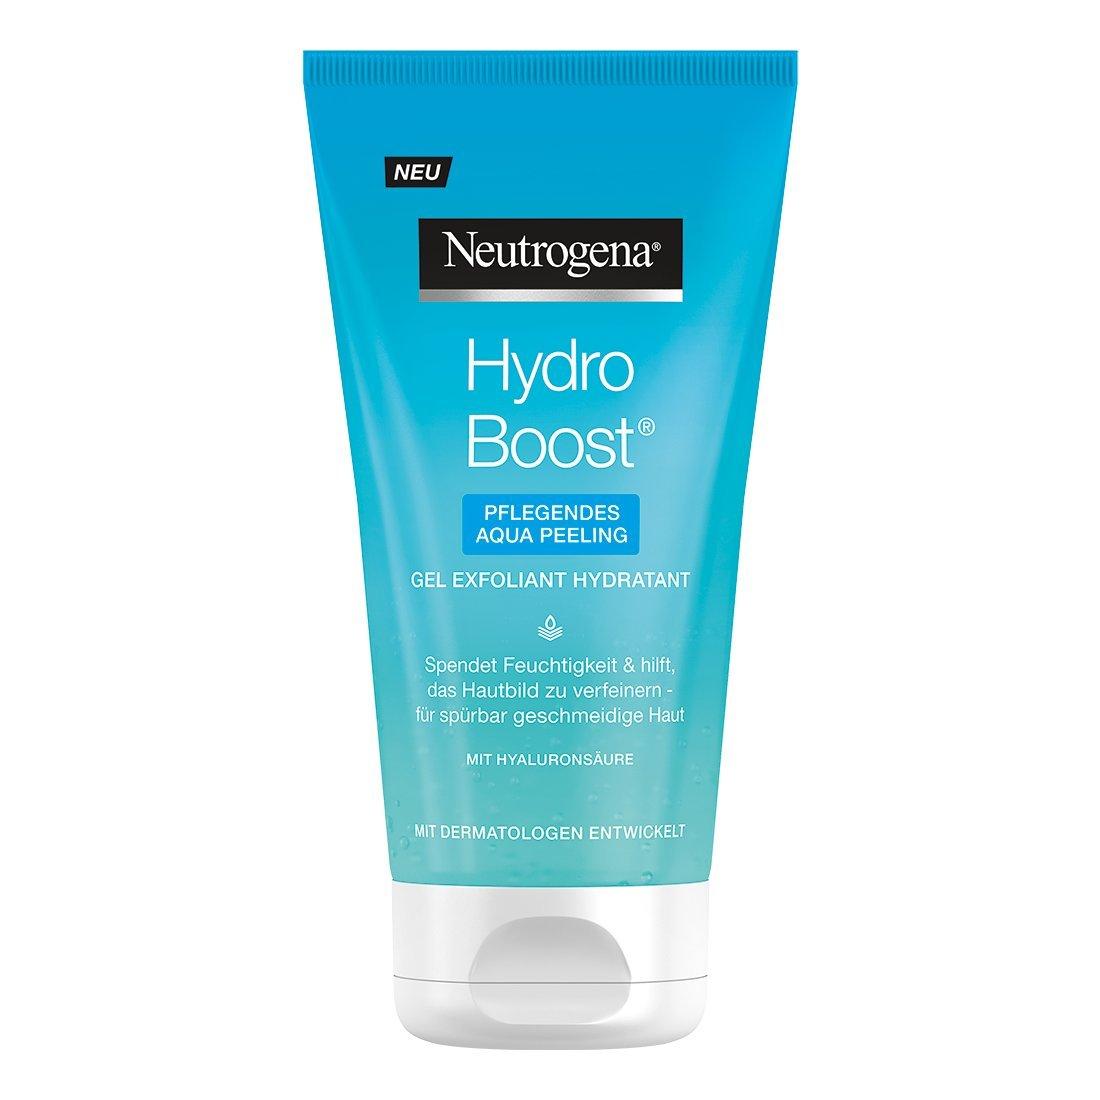 Neutrogena Hydro Boost pflegendes Aqua Peeling, confezione da (3X 150ML) 92351